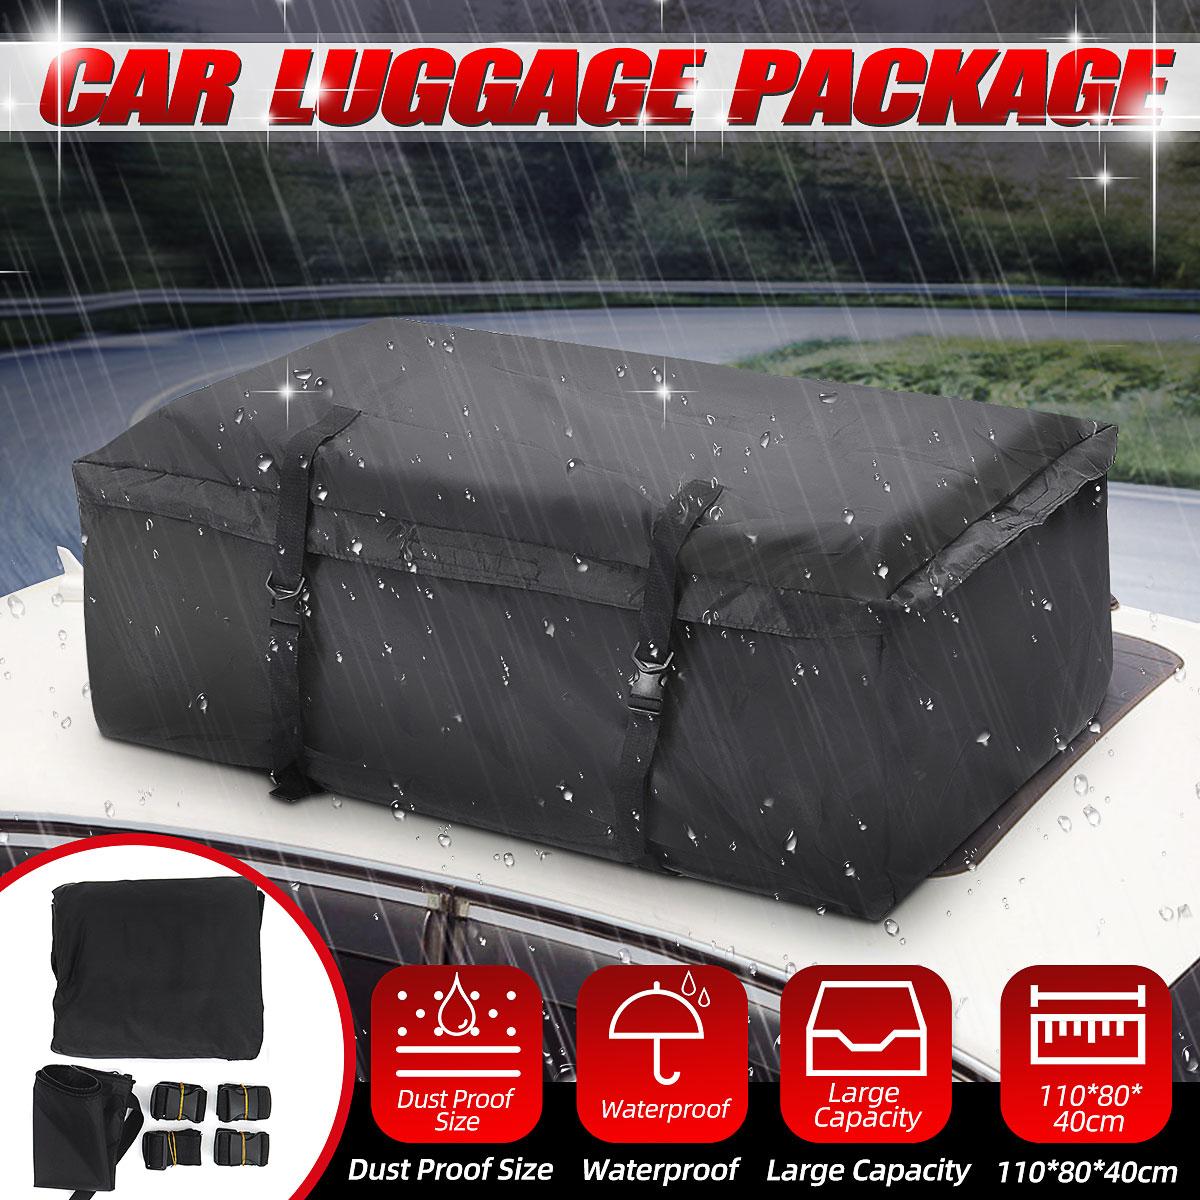 Bolsa para techo de coche de 110x80x40cm, bolsa para techo, portaequipajes, almacenamiento de equipaje, viaje, impermeable, furgoneta SUV para coches